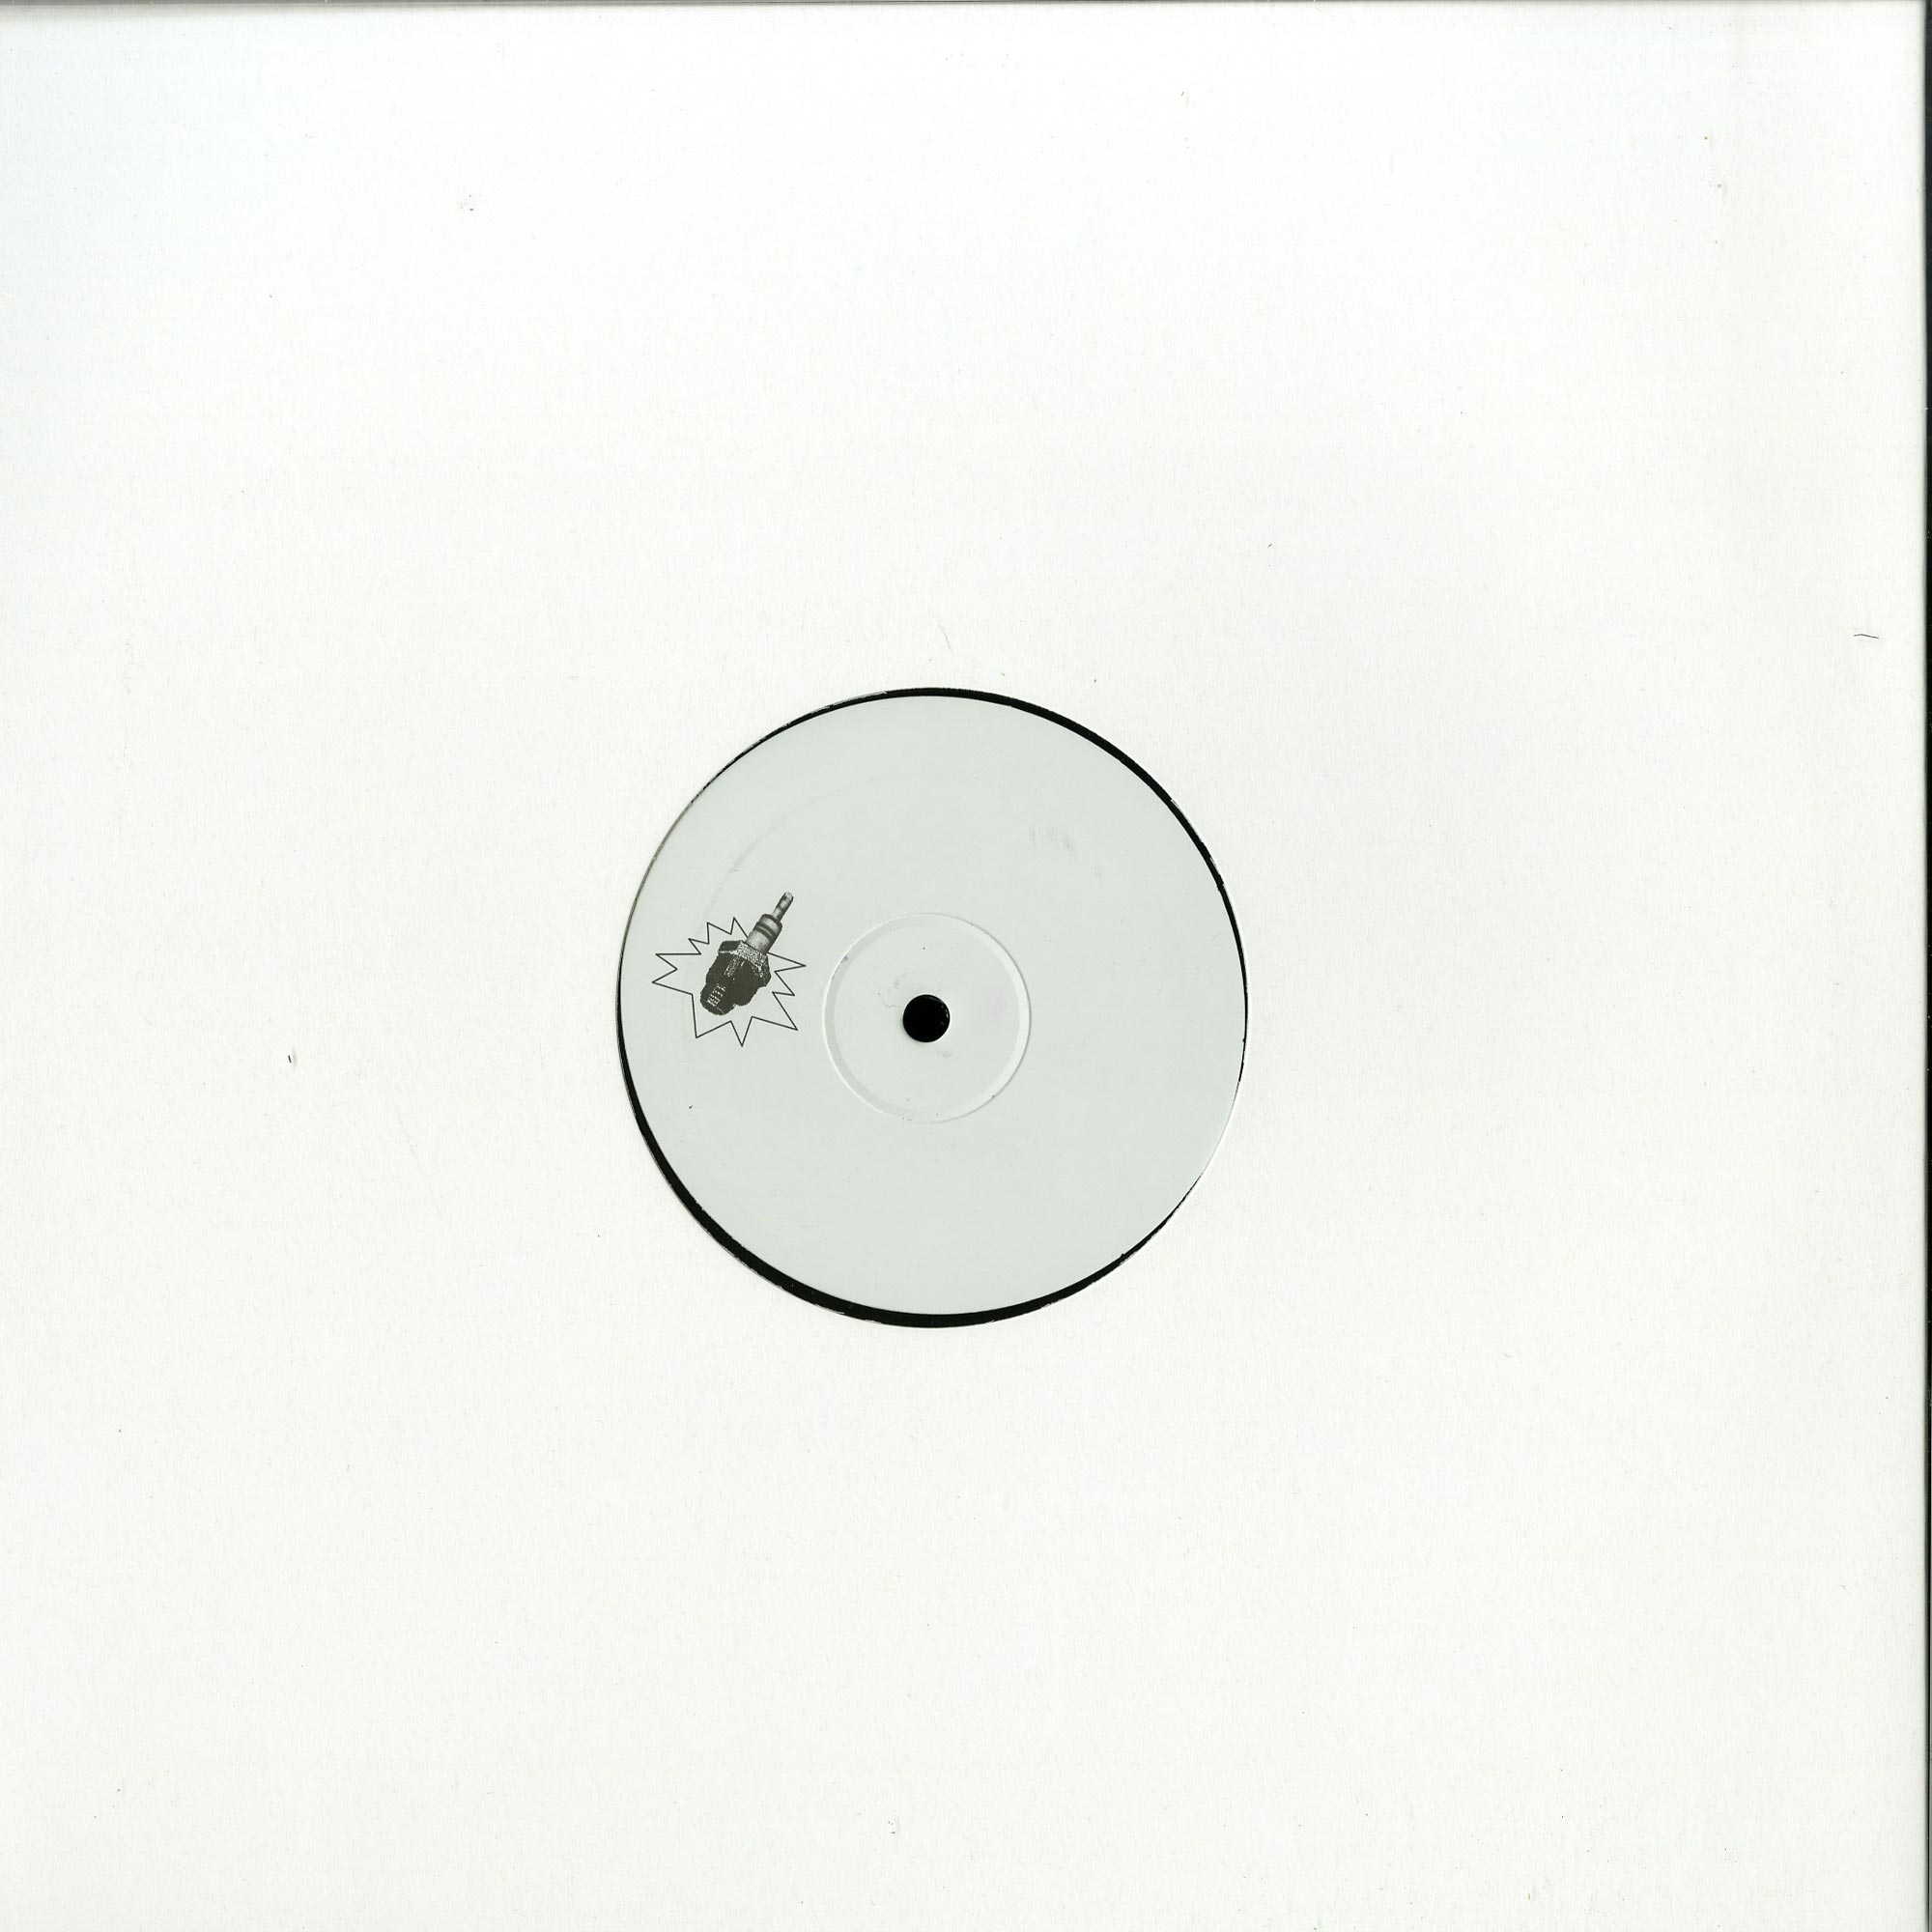 Samo DJ - BORN FREE 31